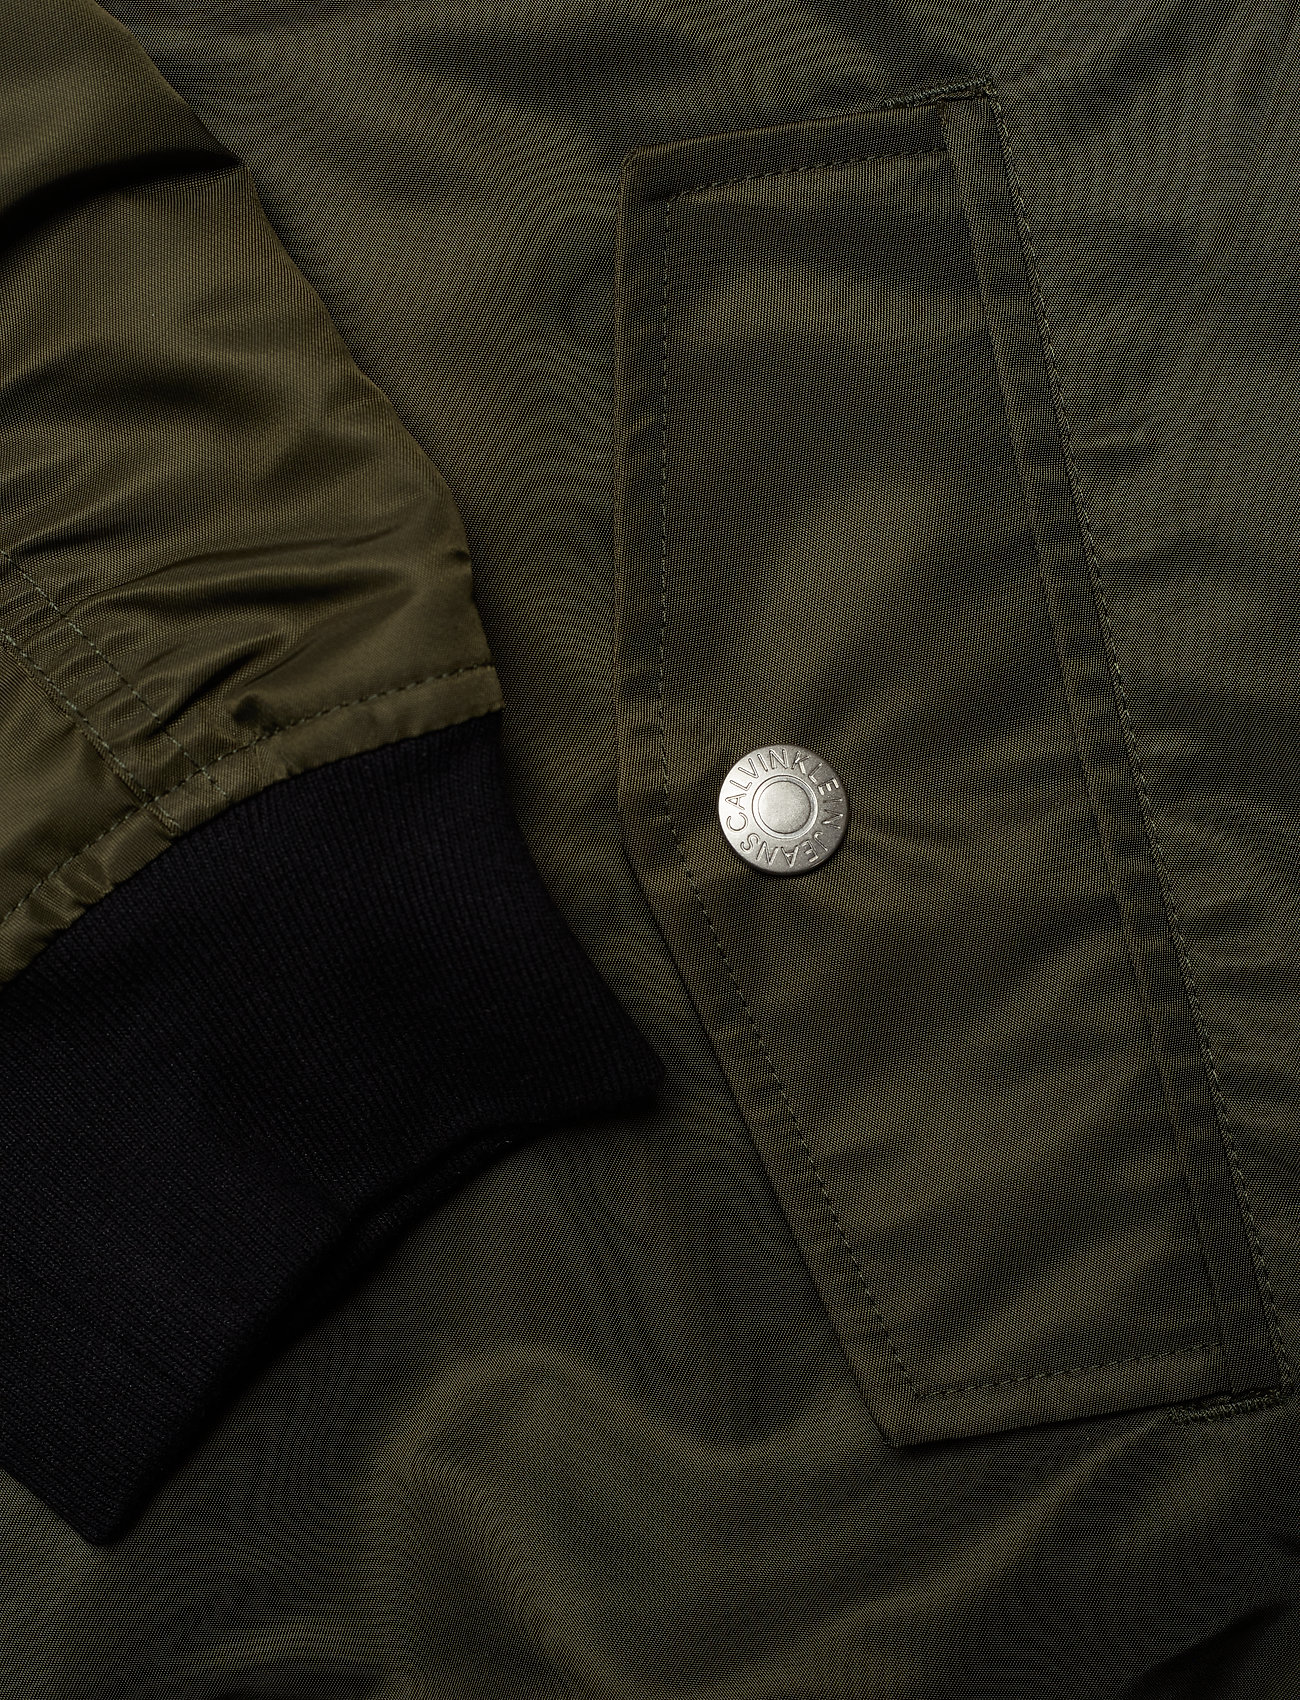 Magrape Klein Instit Jeans Hem LeafCalvin Logo UqVzGSMp